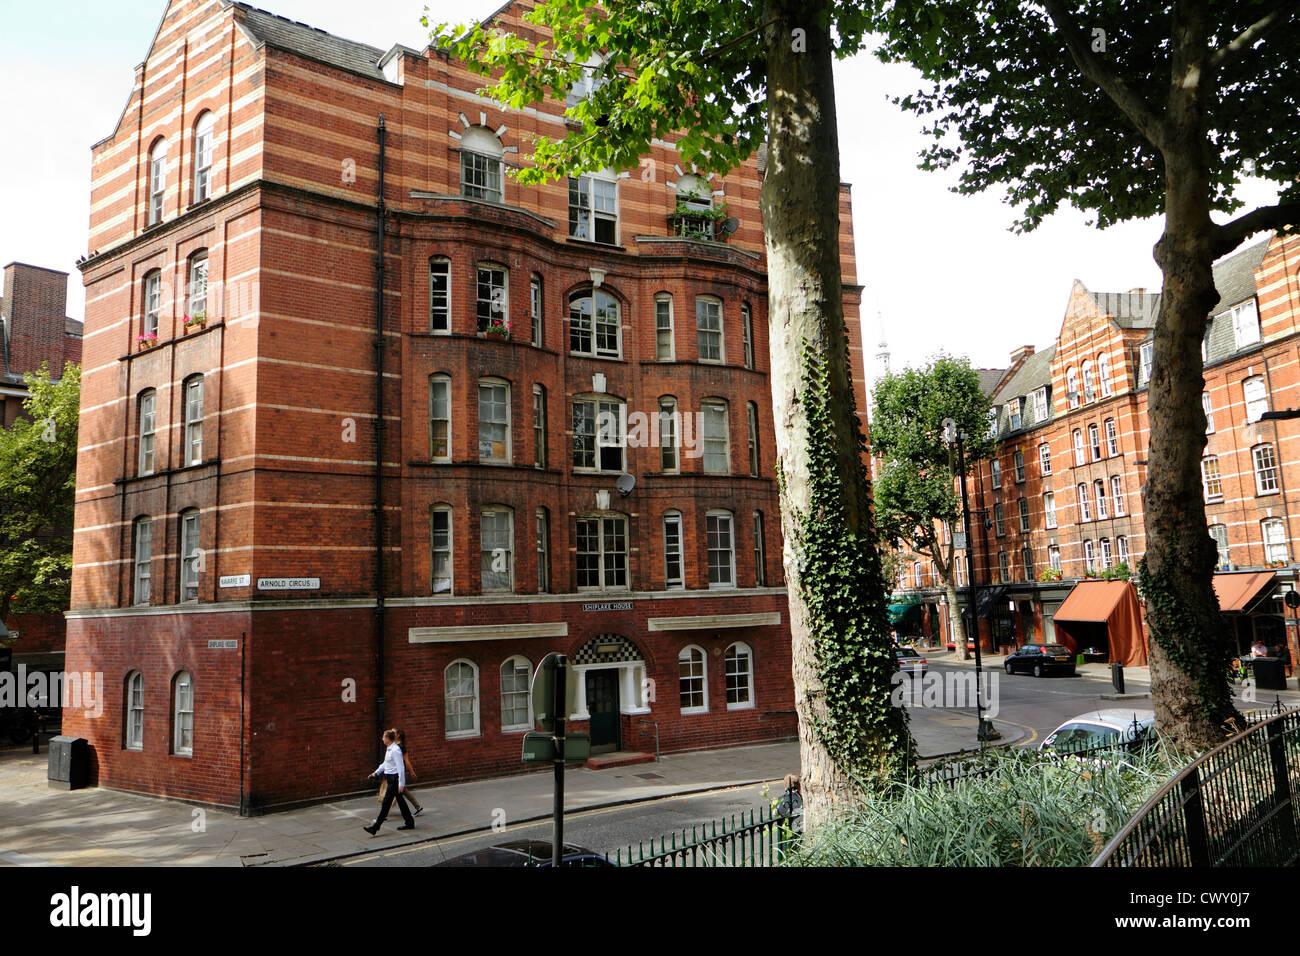 Arnold Circus, Boundary Estate, Bethnal Green, London, UK - Stock Image